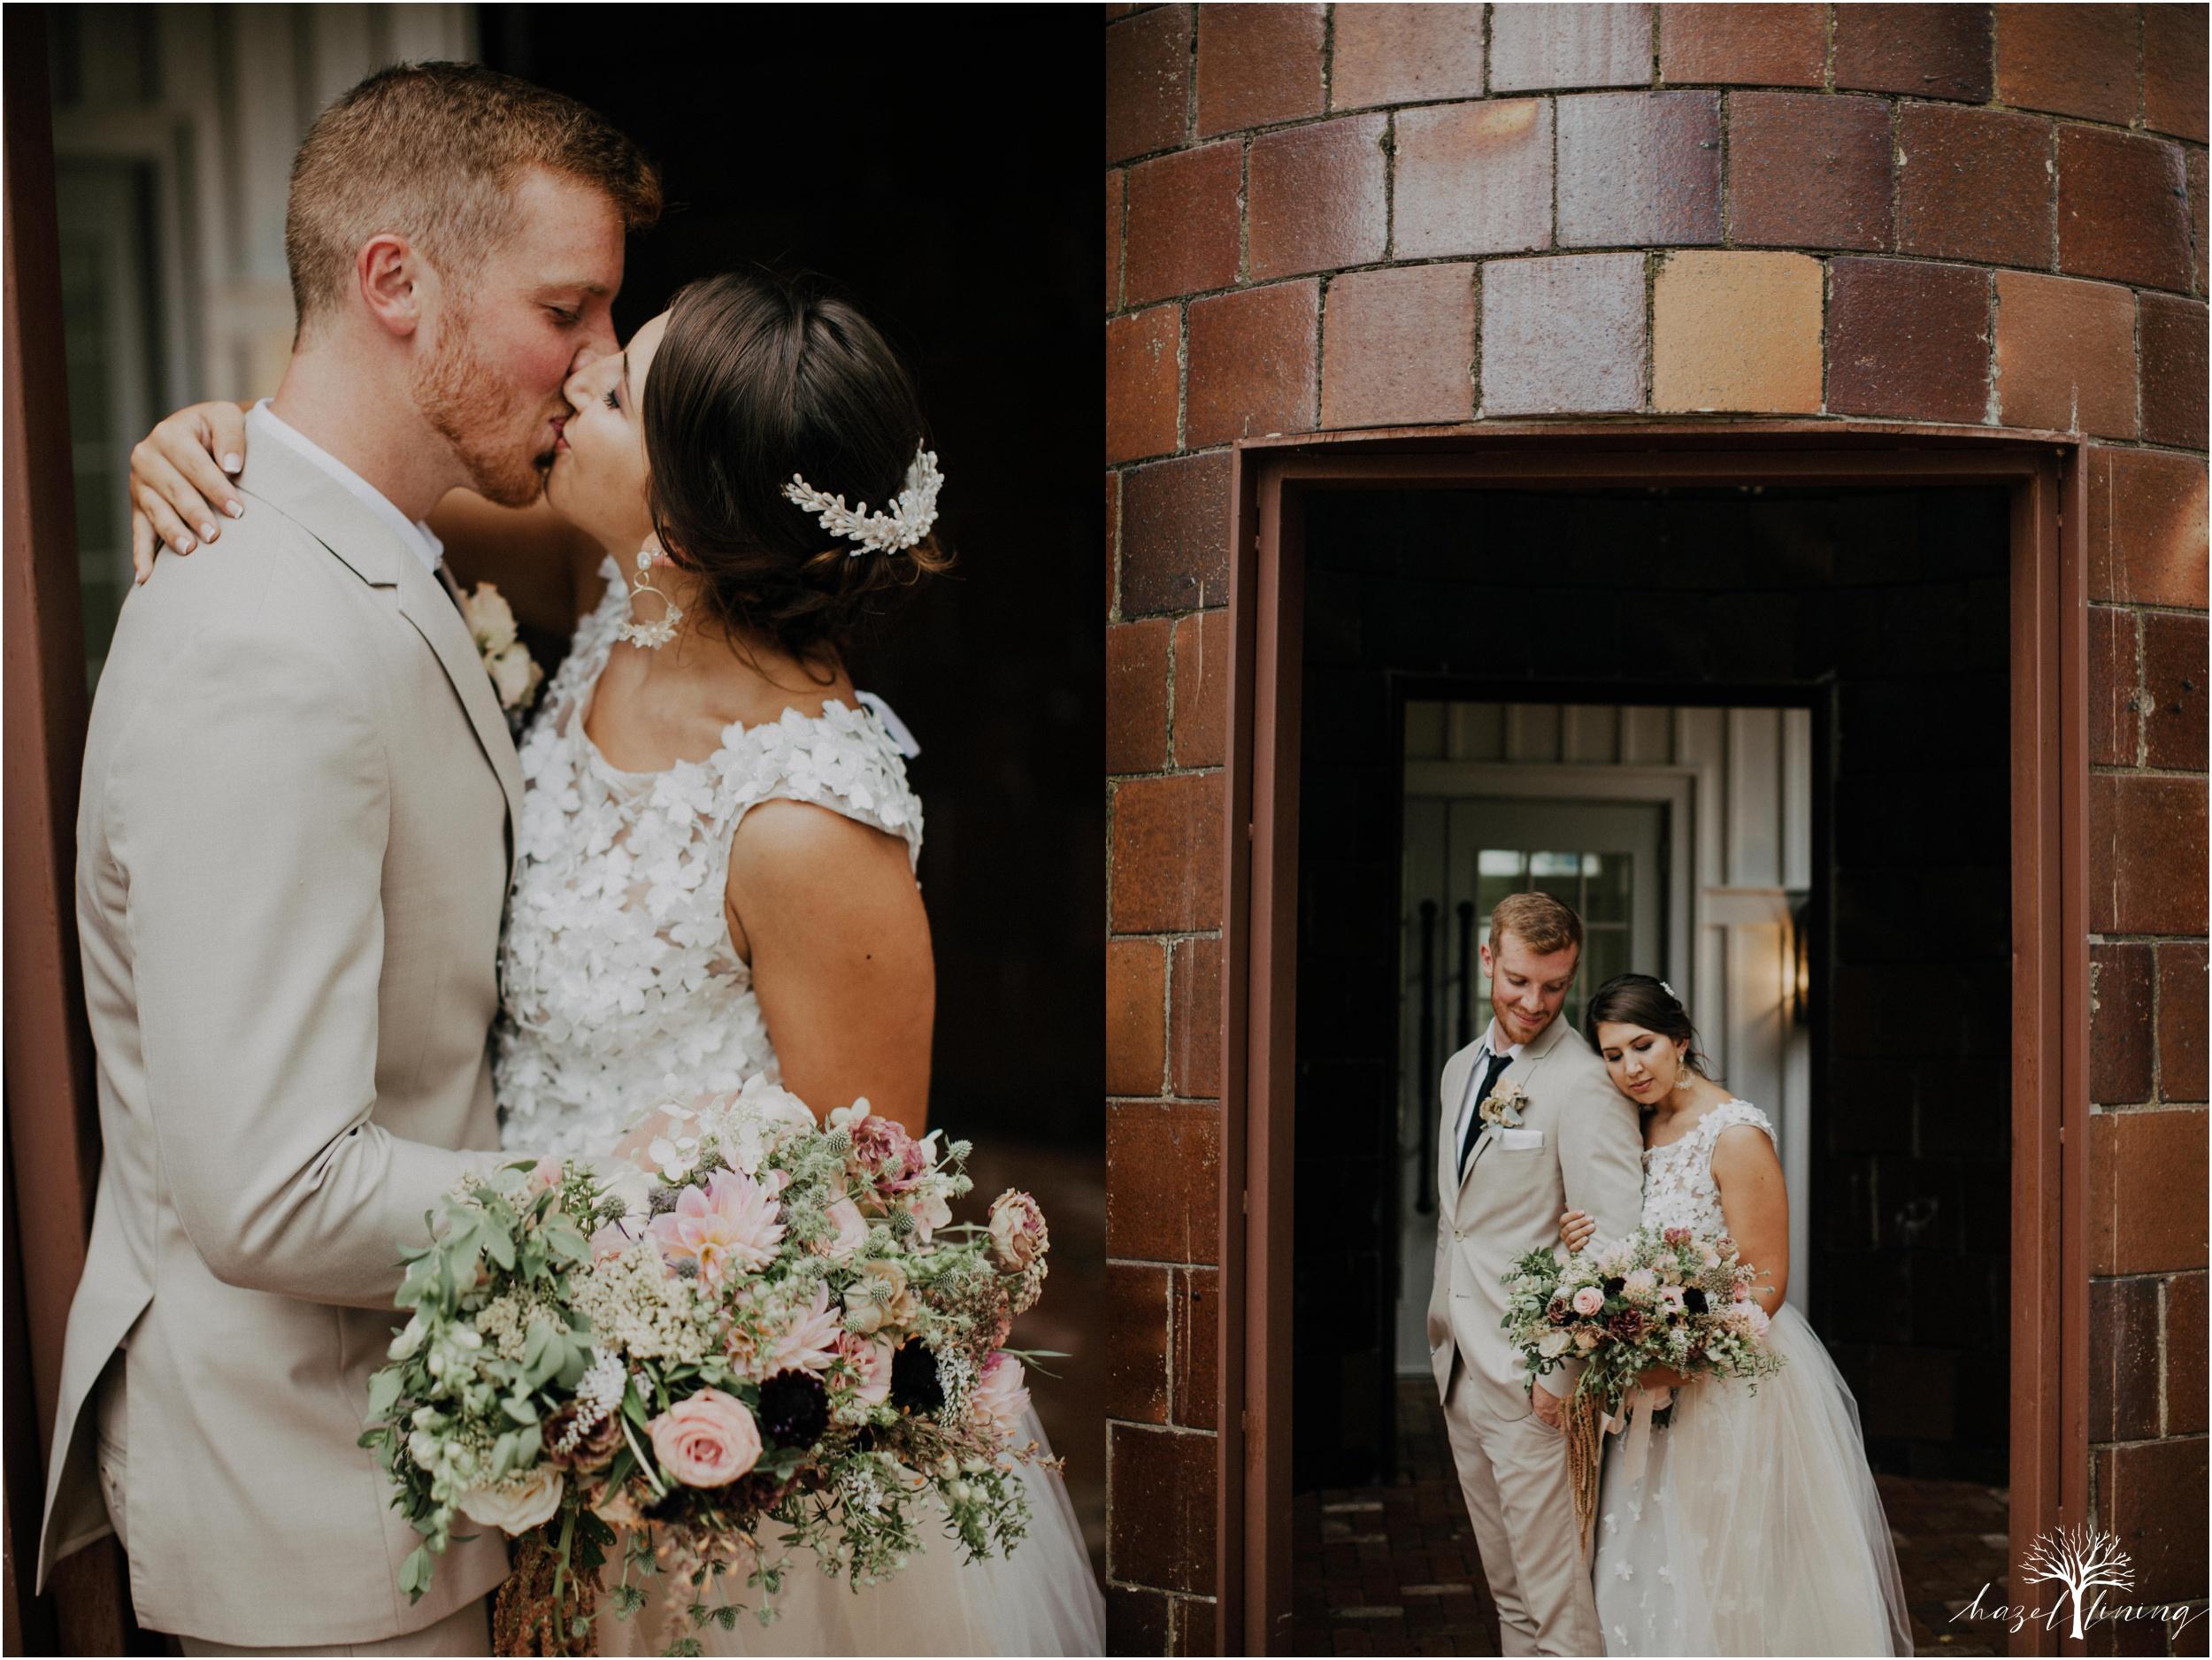 carl-chloe-the-ryland-inn-whitehouse-station-new-jersey-styled-squad-hazel-lining-photography-destination-elopement-wedding-engagement-photography_0019.jpg